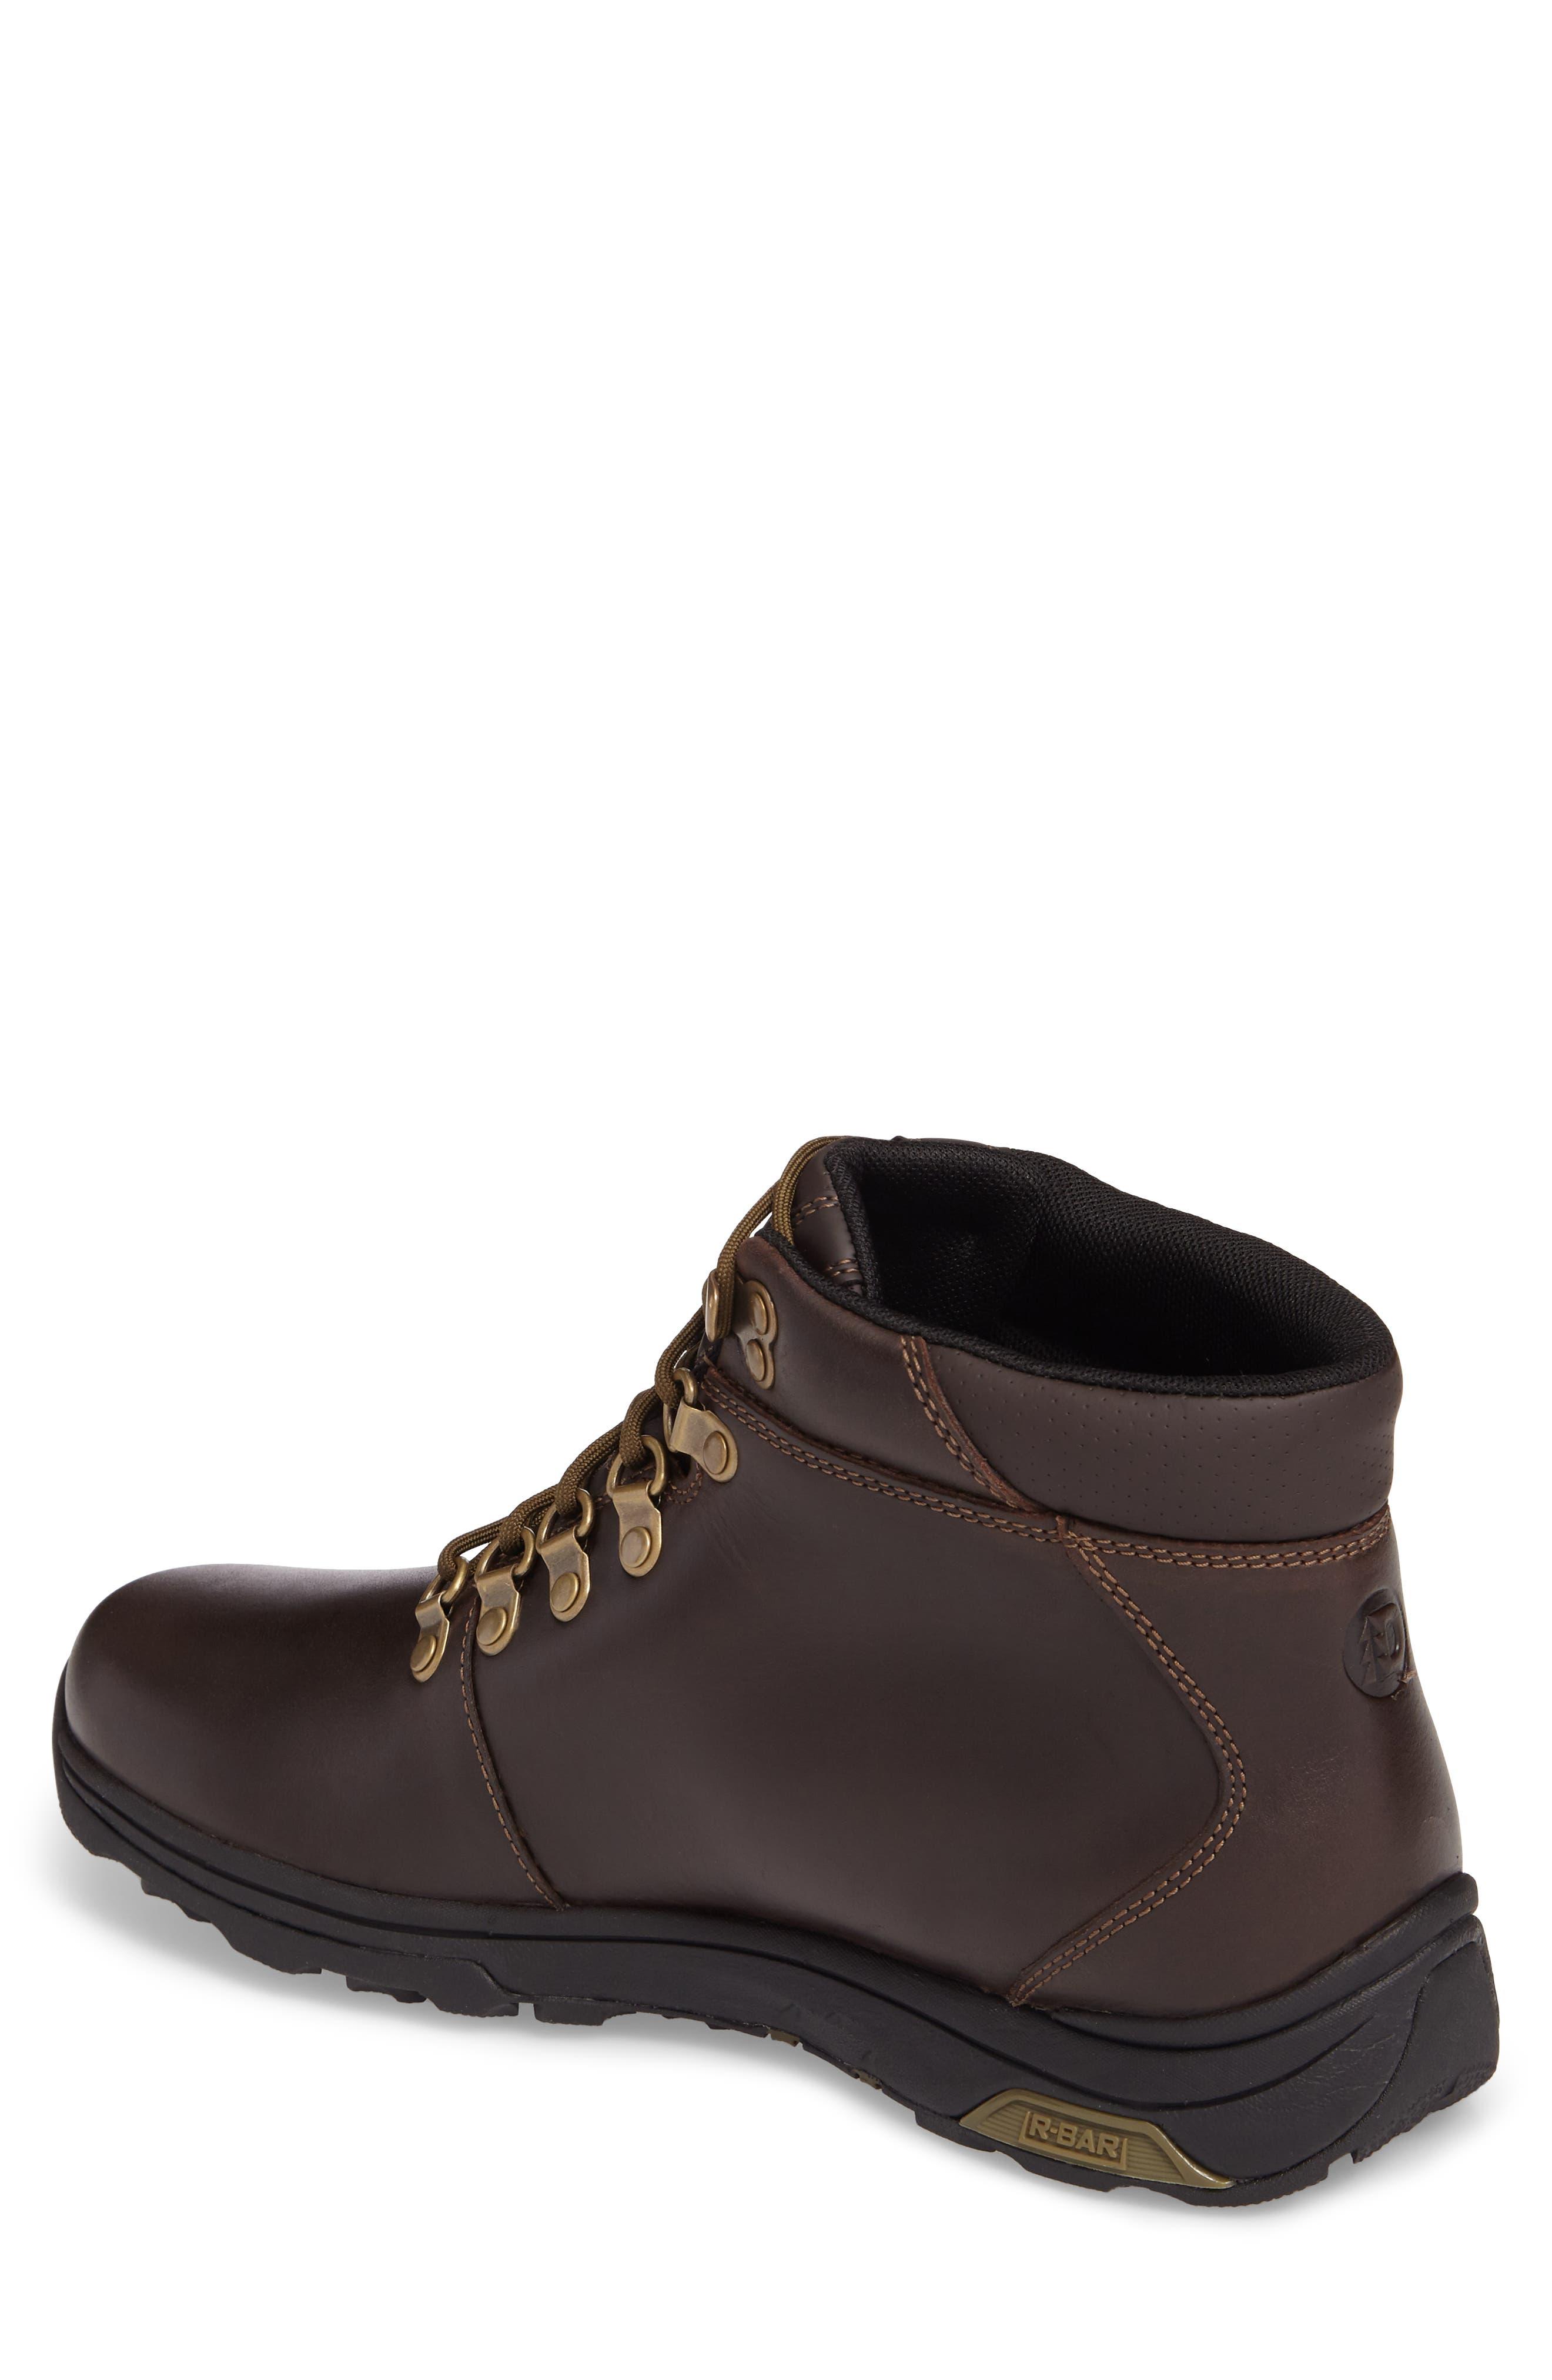 Trukka Waterproof Boot,                             Alternate thumbnail 2, color,                             Brown